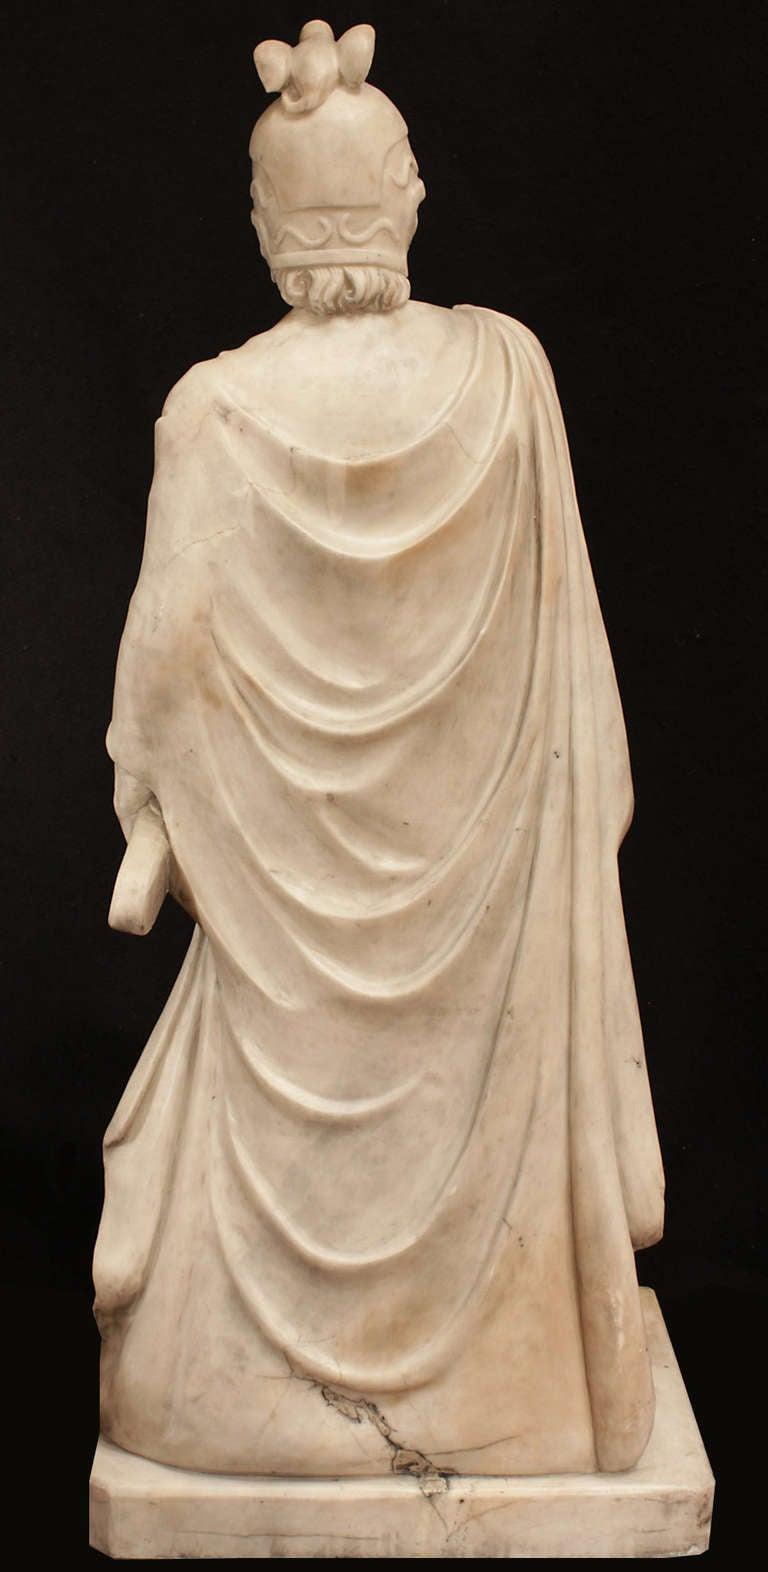 White Marble Statue : Italian th century white carrara marble statue of a